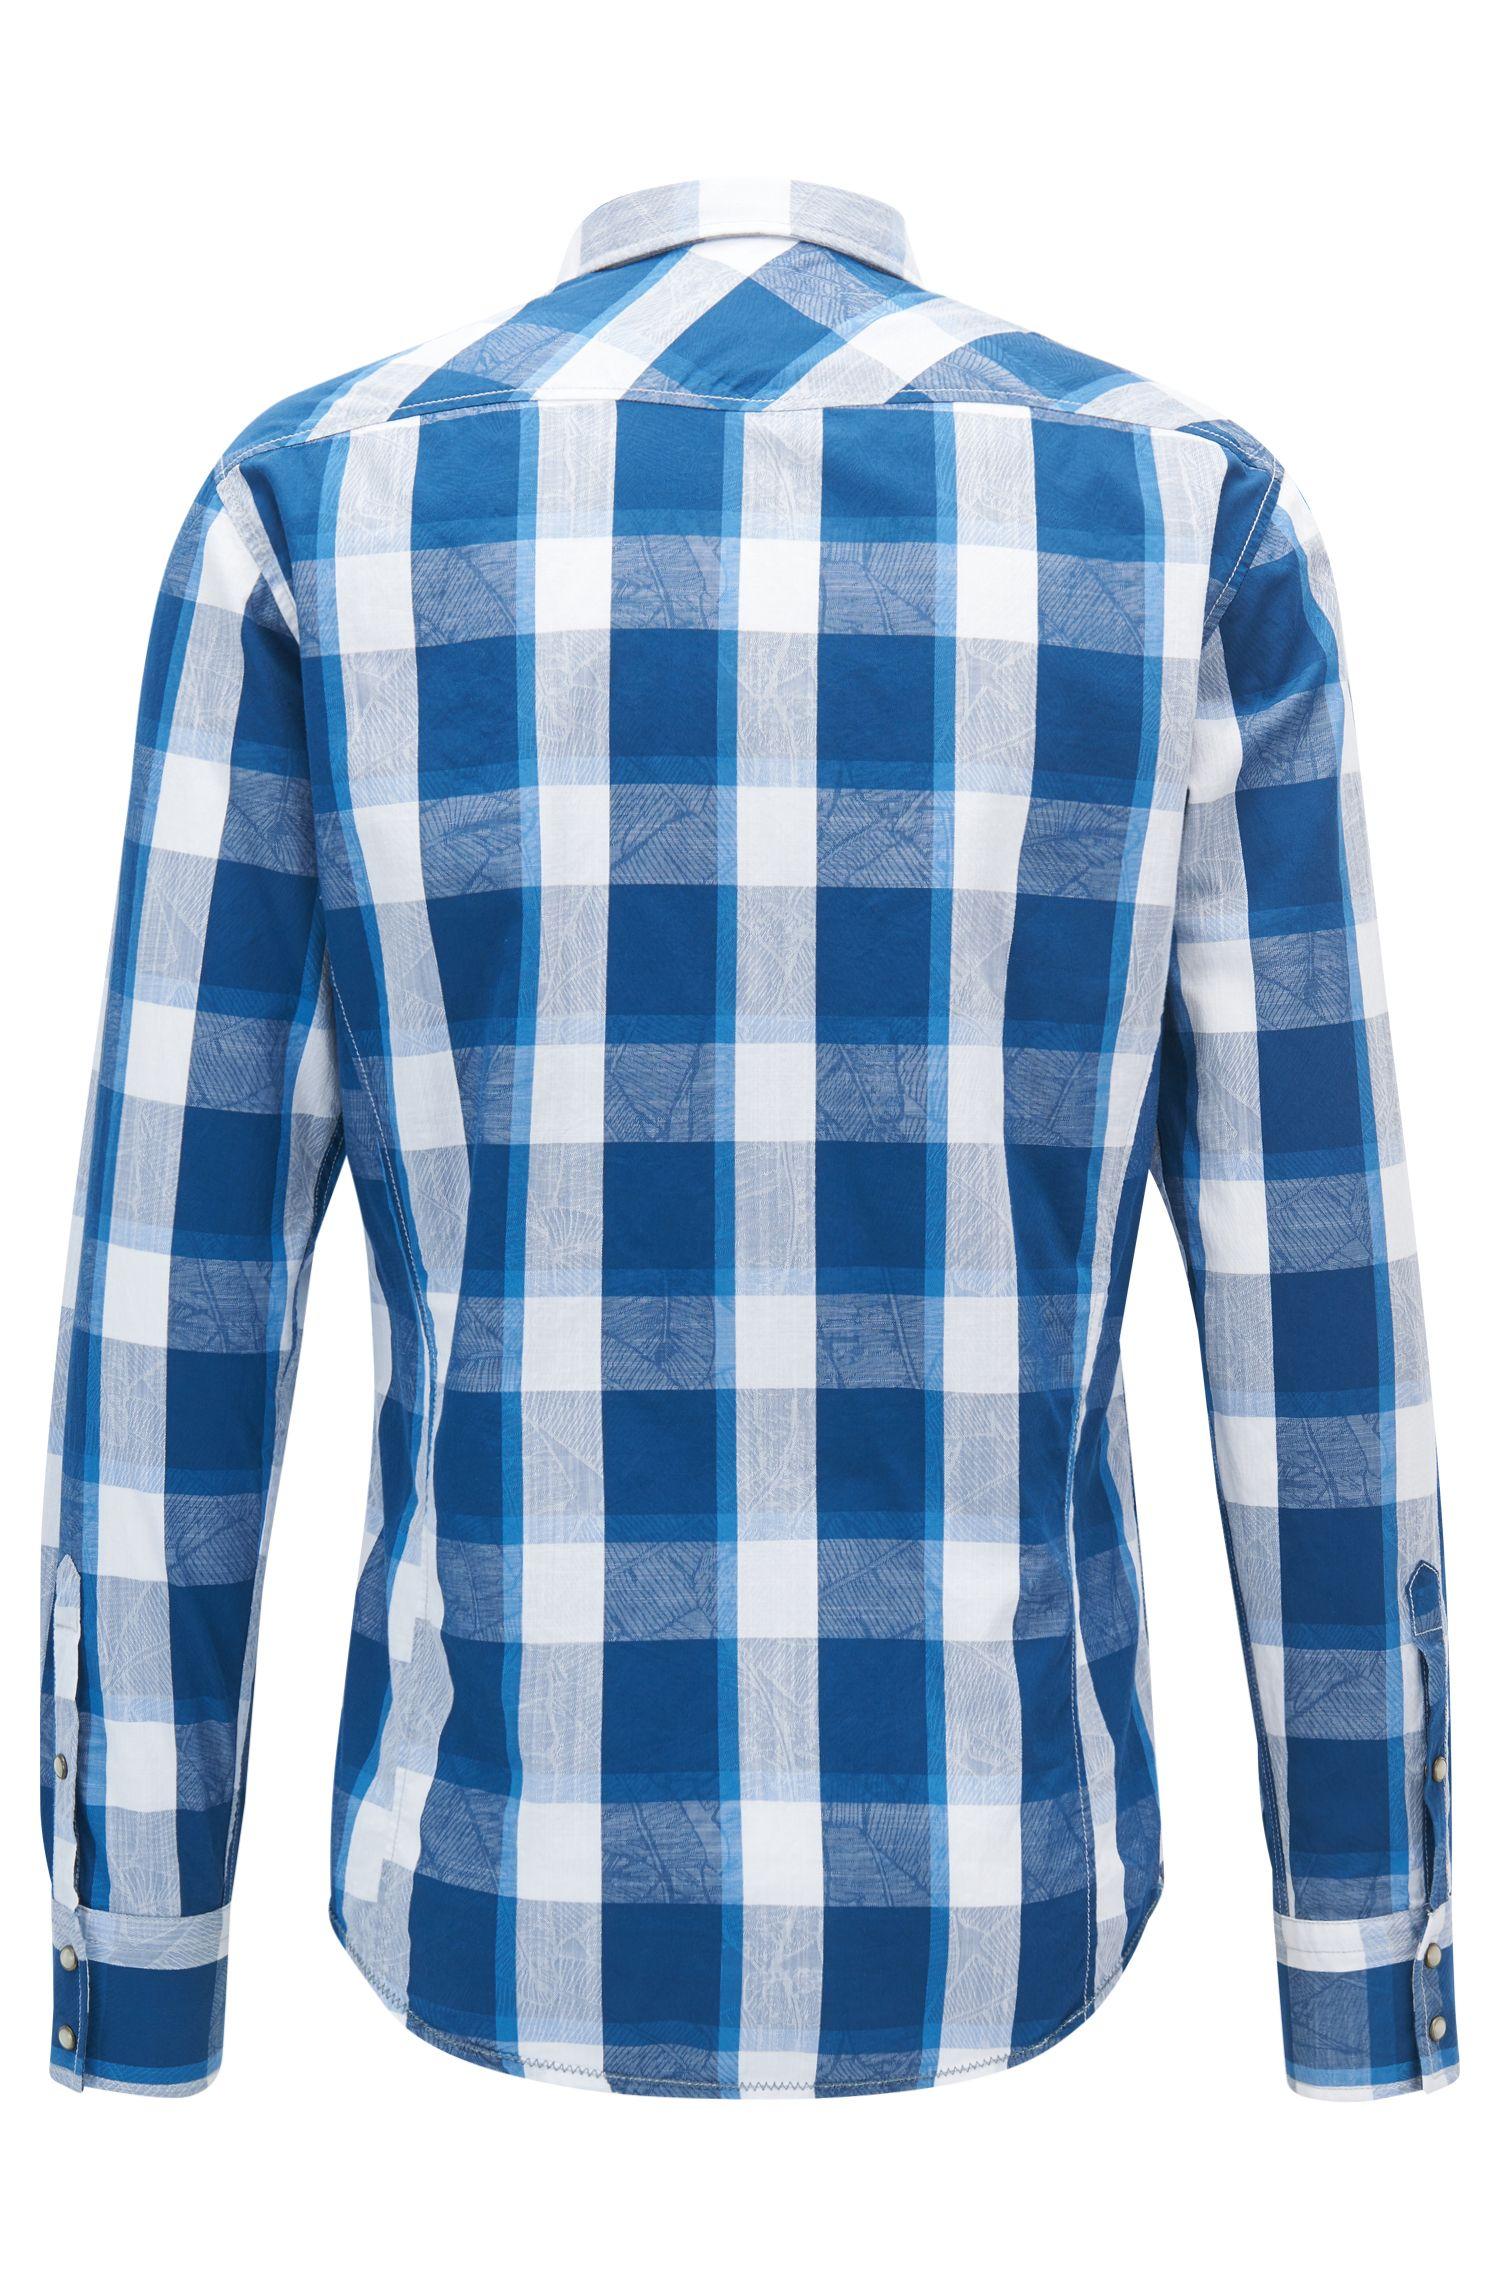 Camicia a quadri slim fit in stile Western in jacquard di cotone